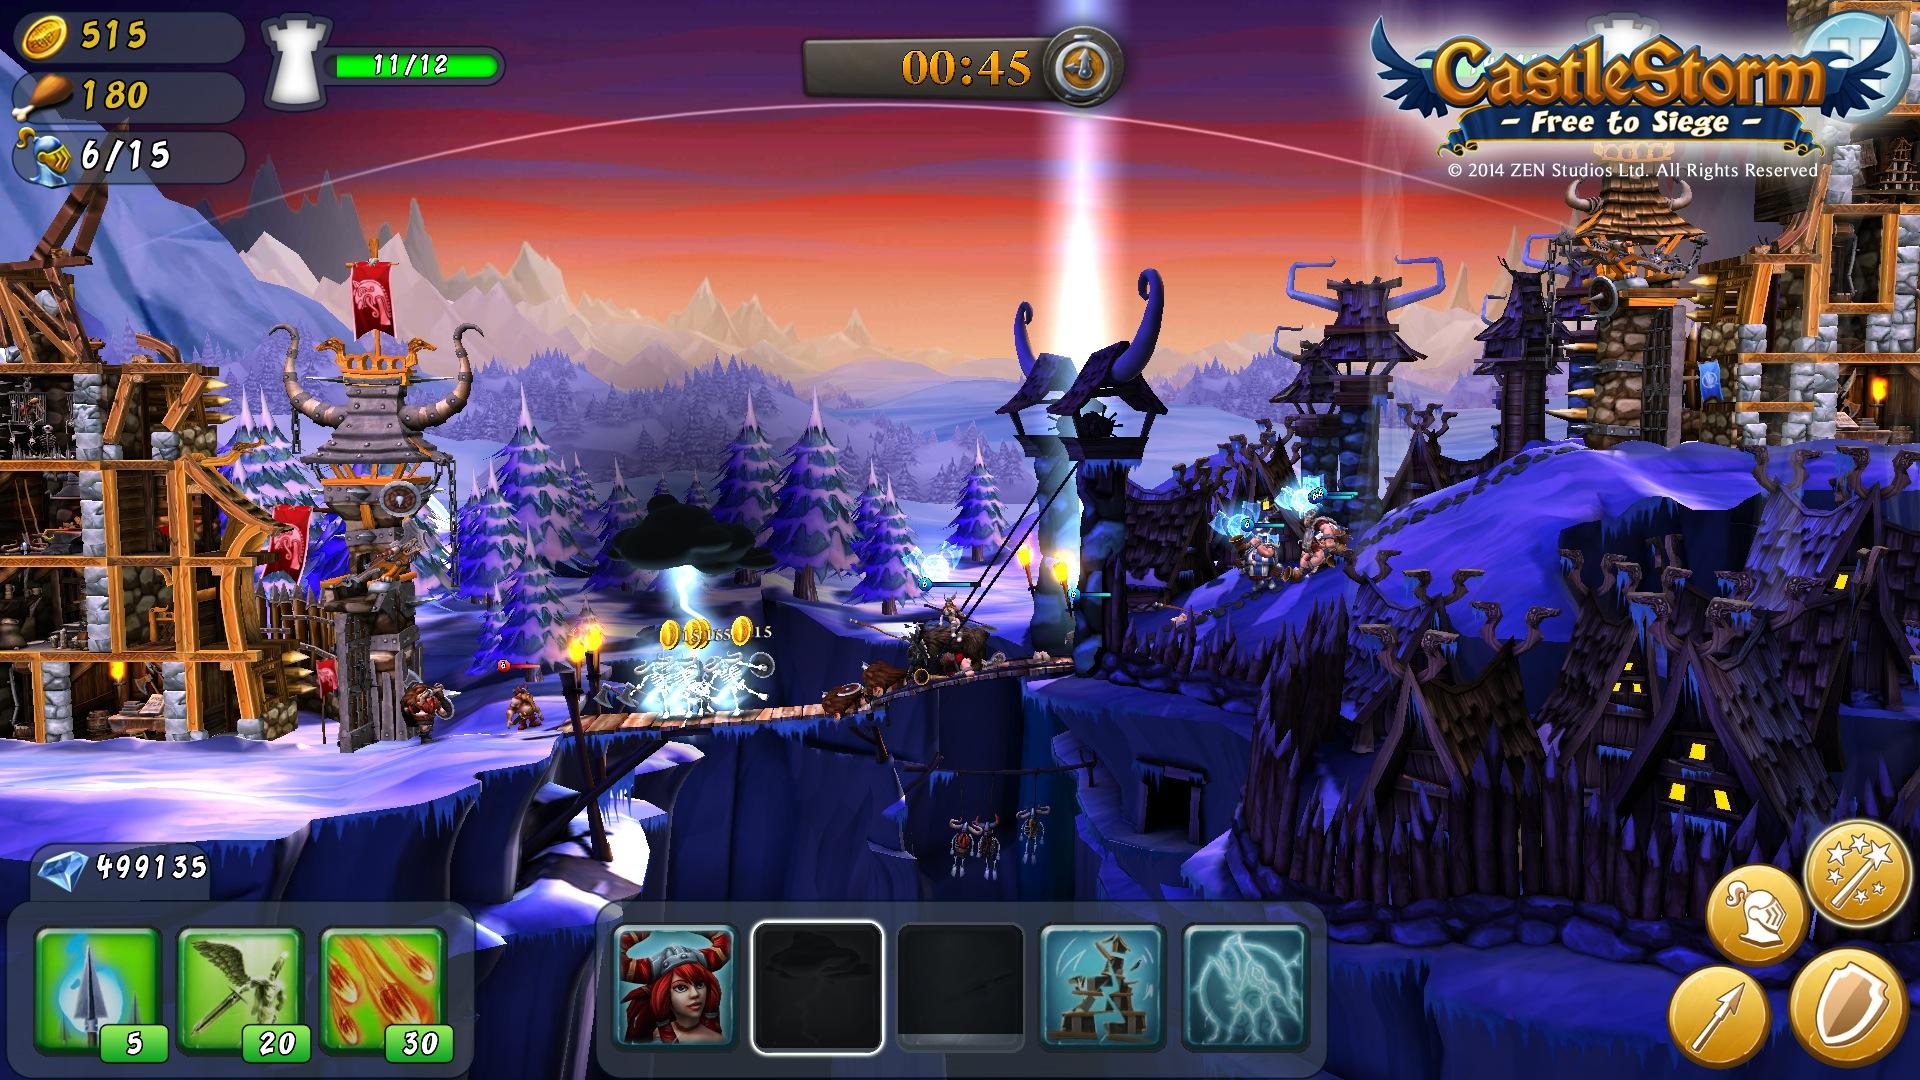 CastleStorm - Free to Siege 5